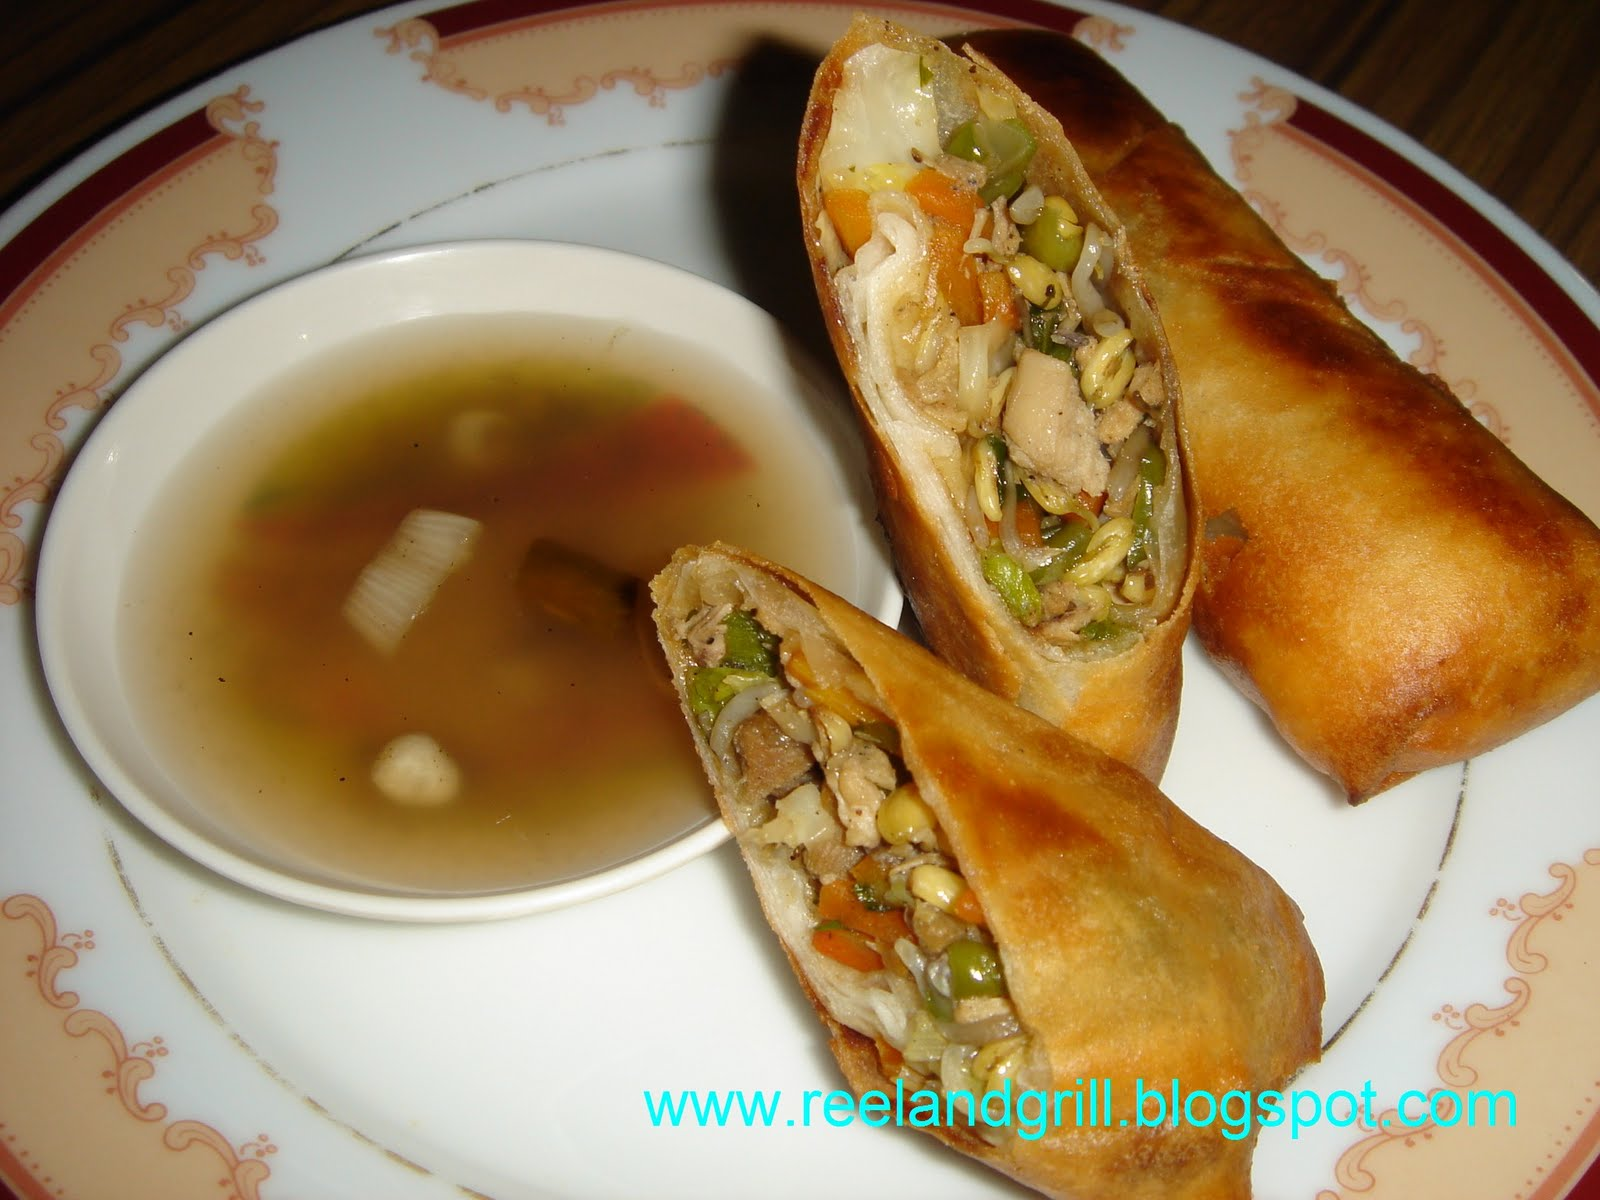 ... : Lumpia or Lumpiang Prito or Lumpiang Gulay (Vegetable Spring Roll